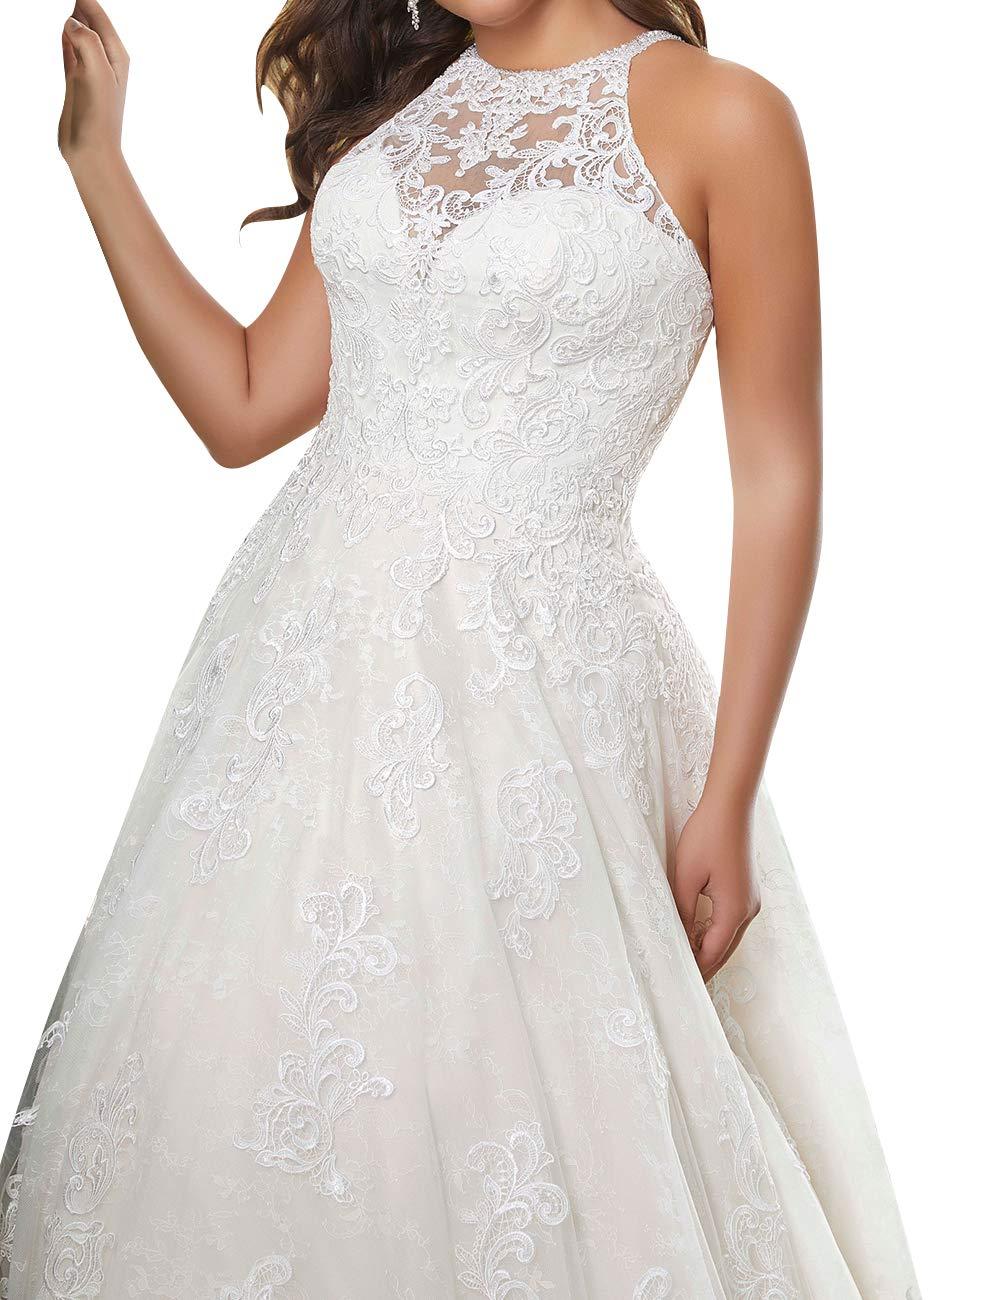 Wedding Dress Lace Bride Dresses Halter Wedding Gown Plus Size Wedding  Dresses A Line Bridal Gowns Ivory